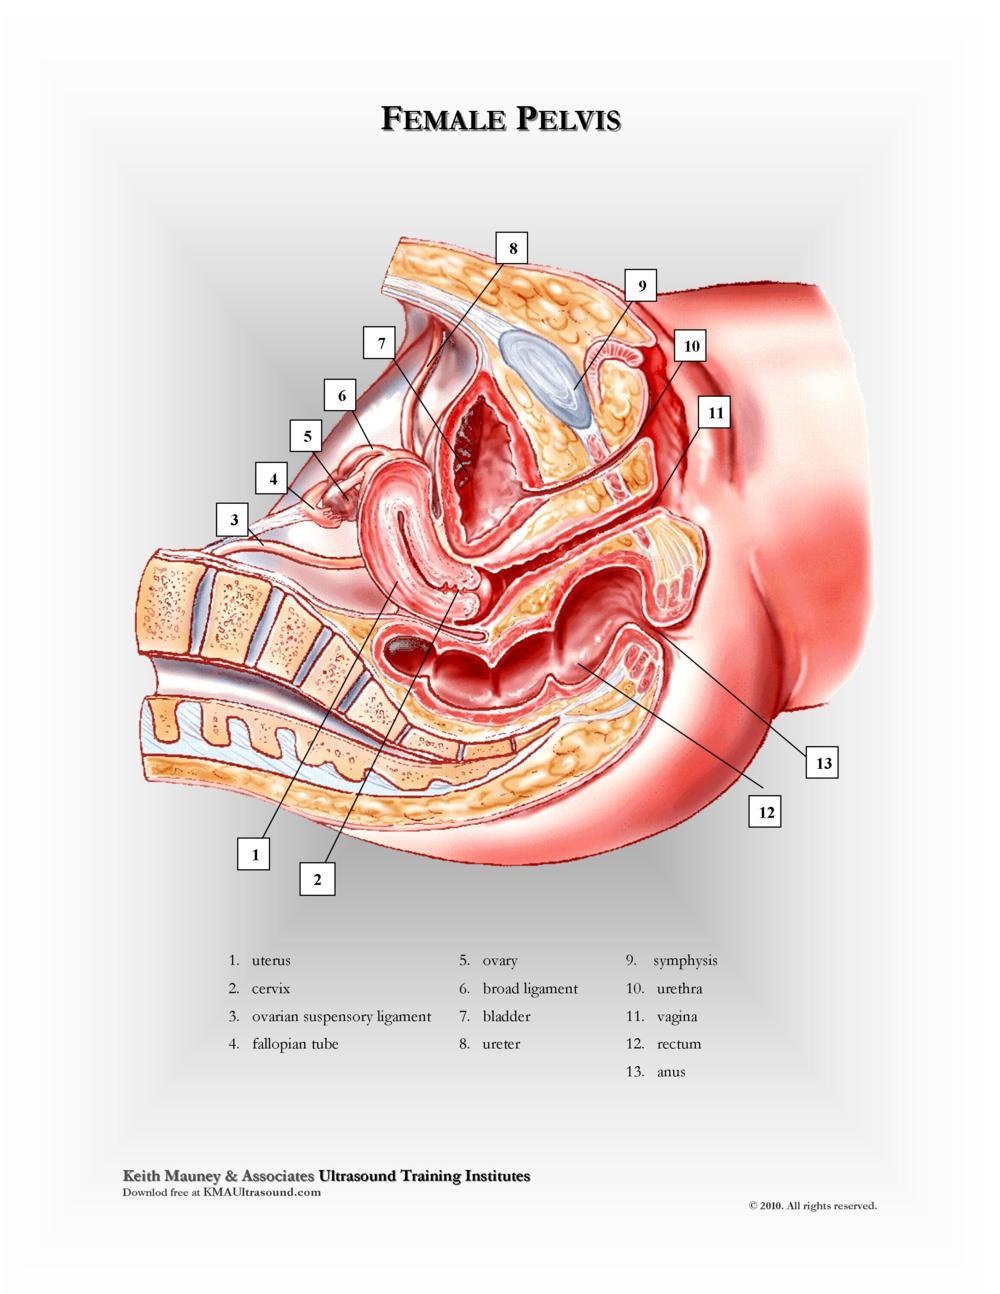 KMA Ultrasound Female Pelvis